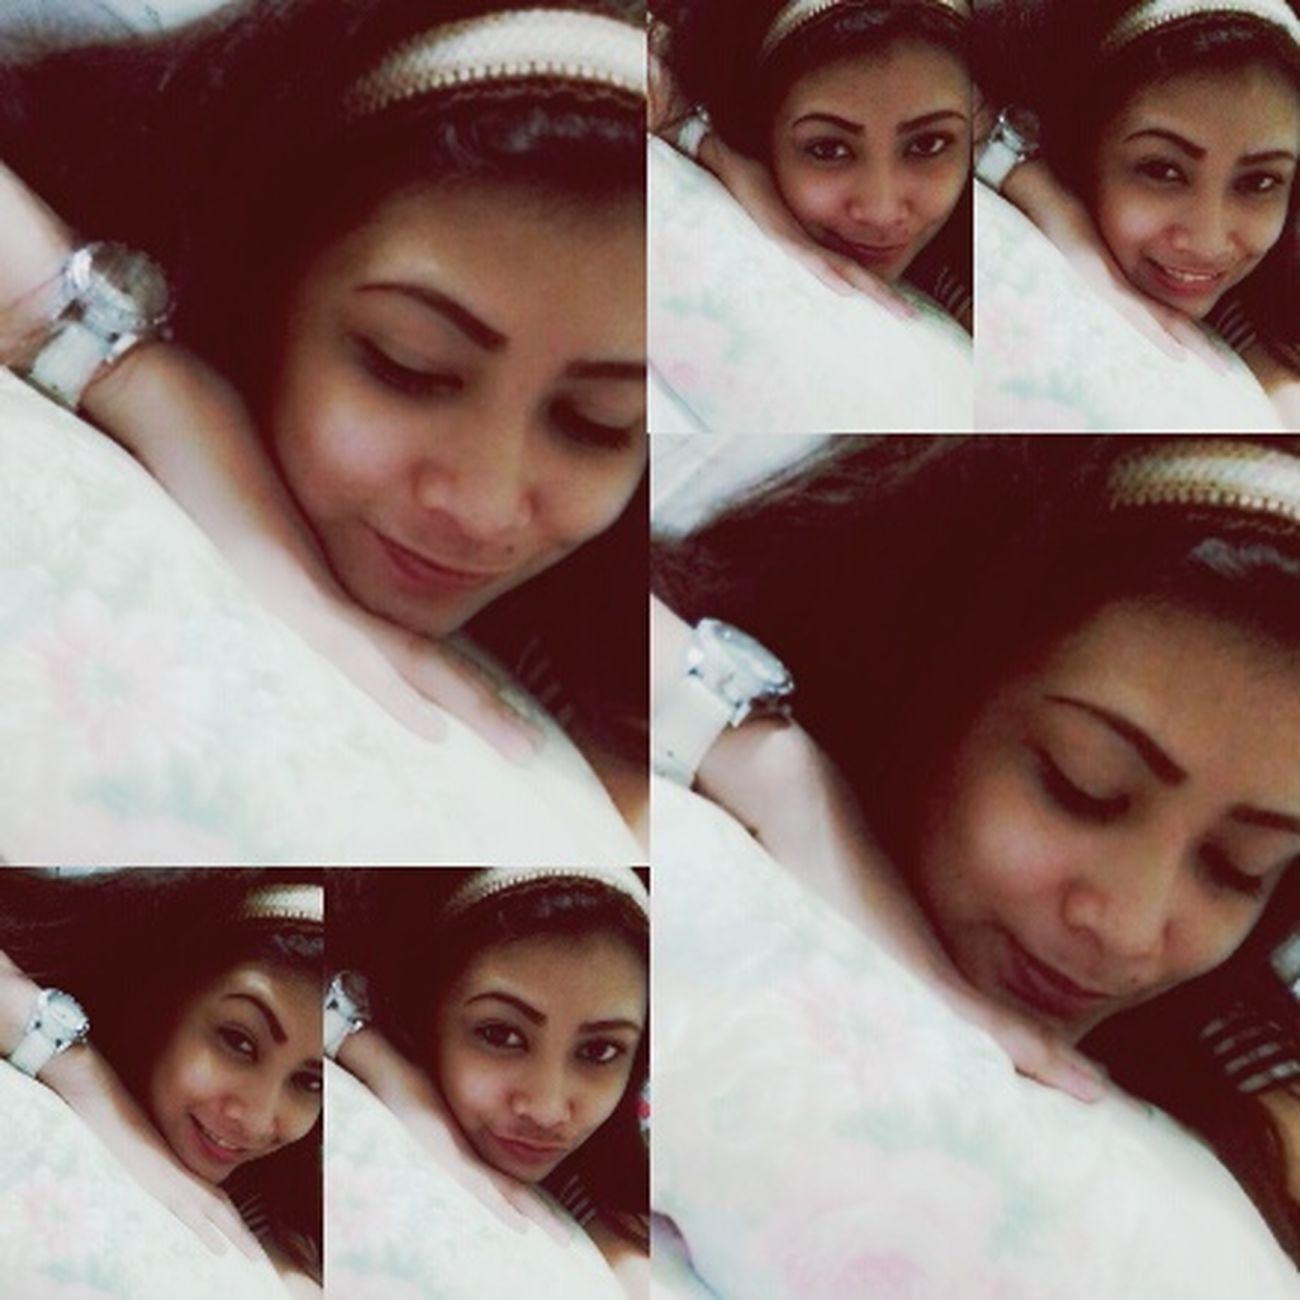 Goodnight! ❤